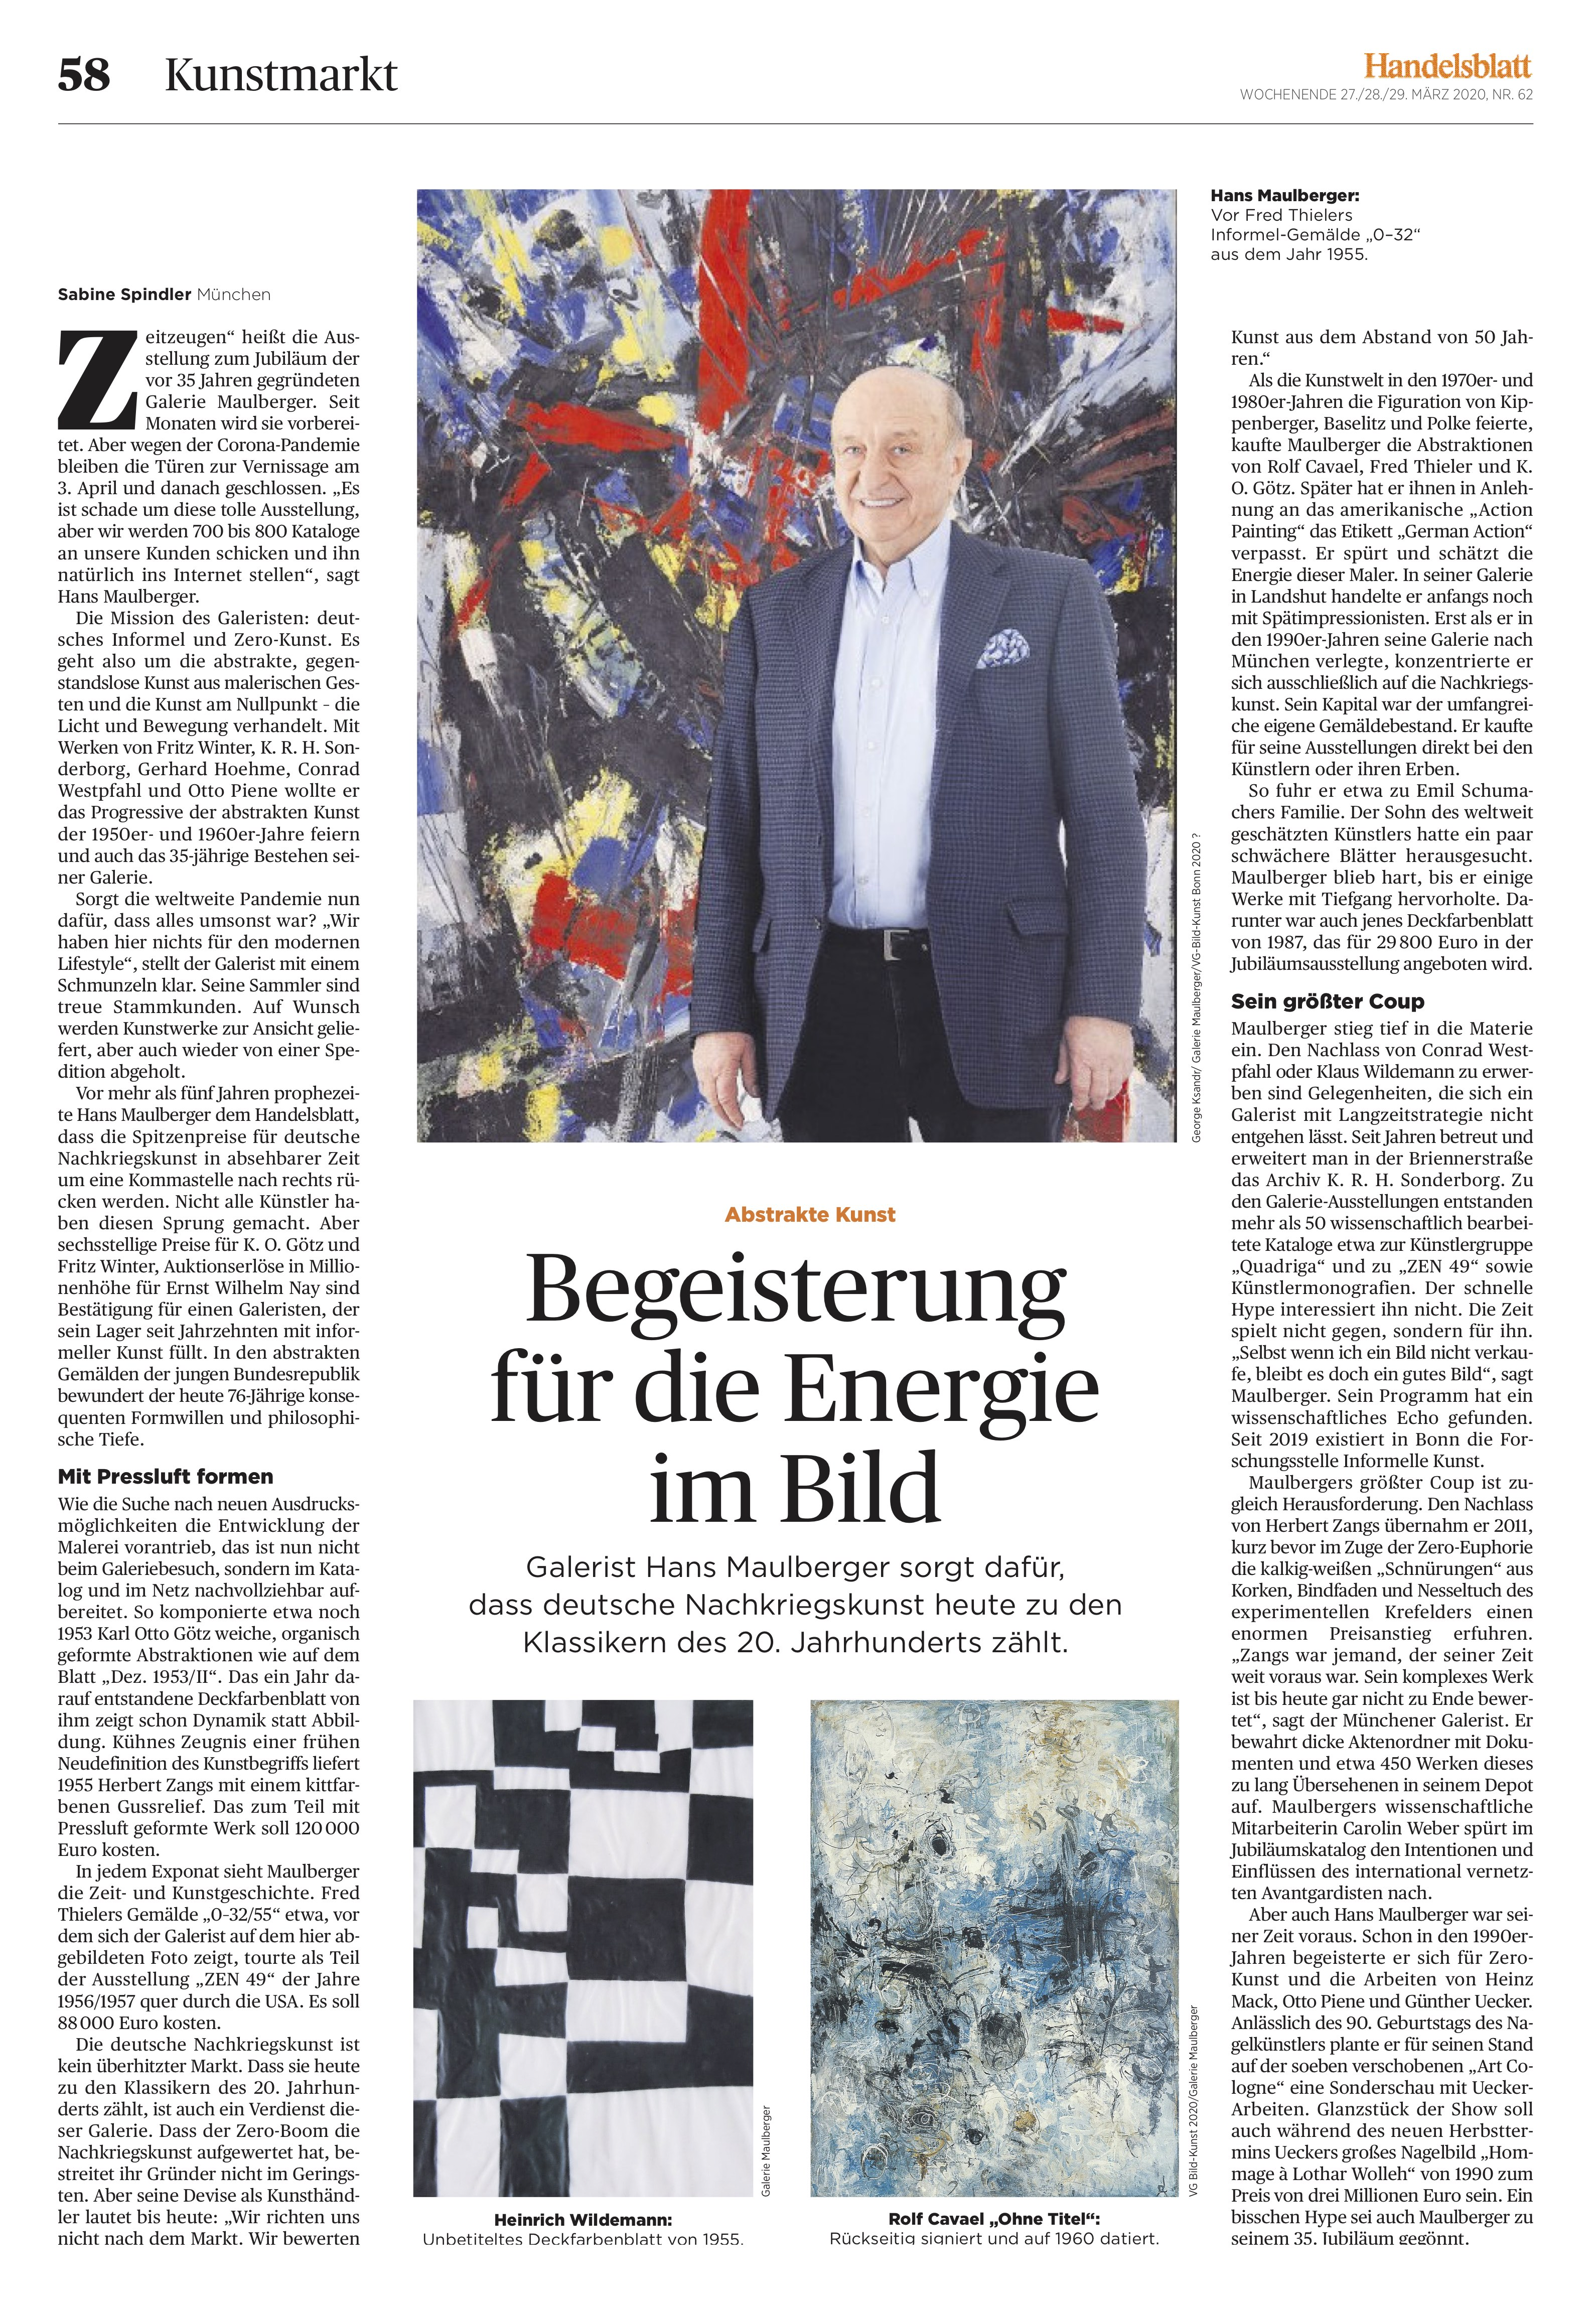 Presse Galerie Maulberger Handelsblatt 2020